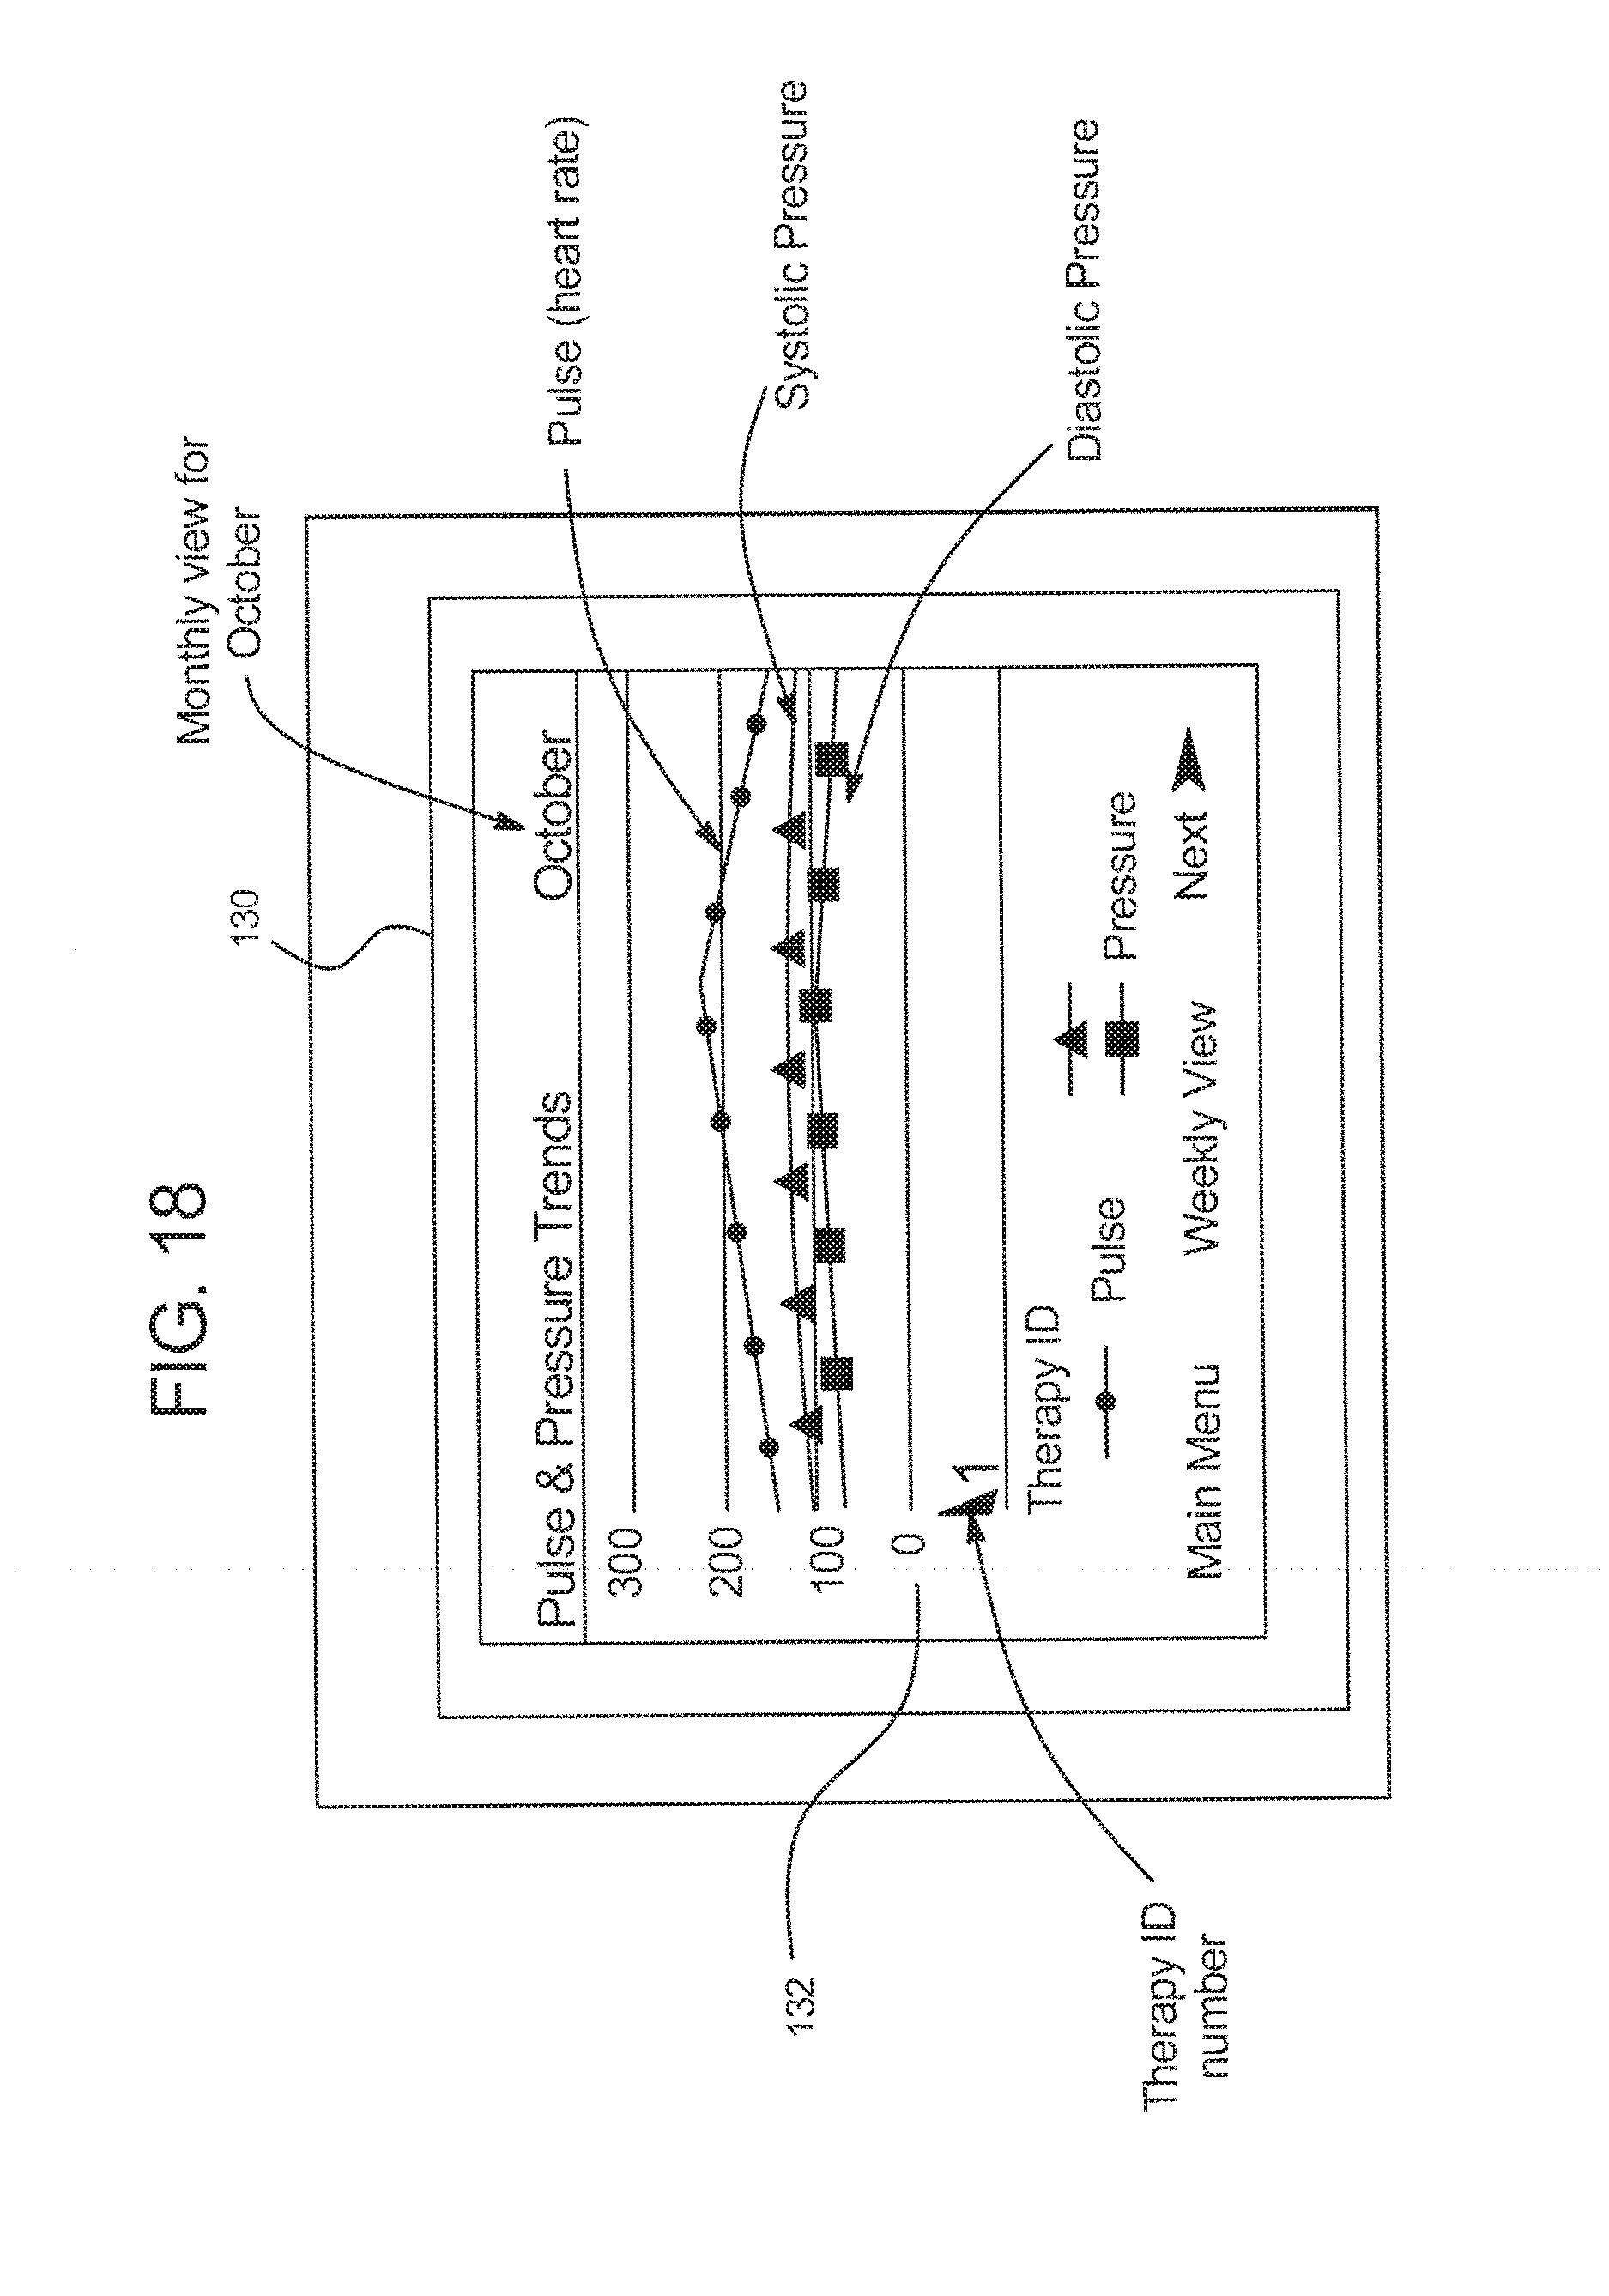 Patent US 10,016,554 B2 on